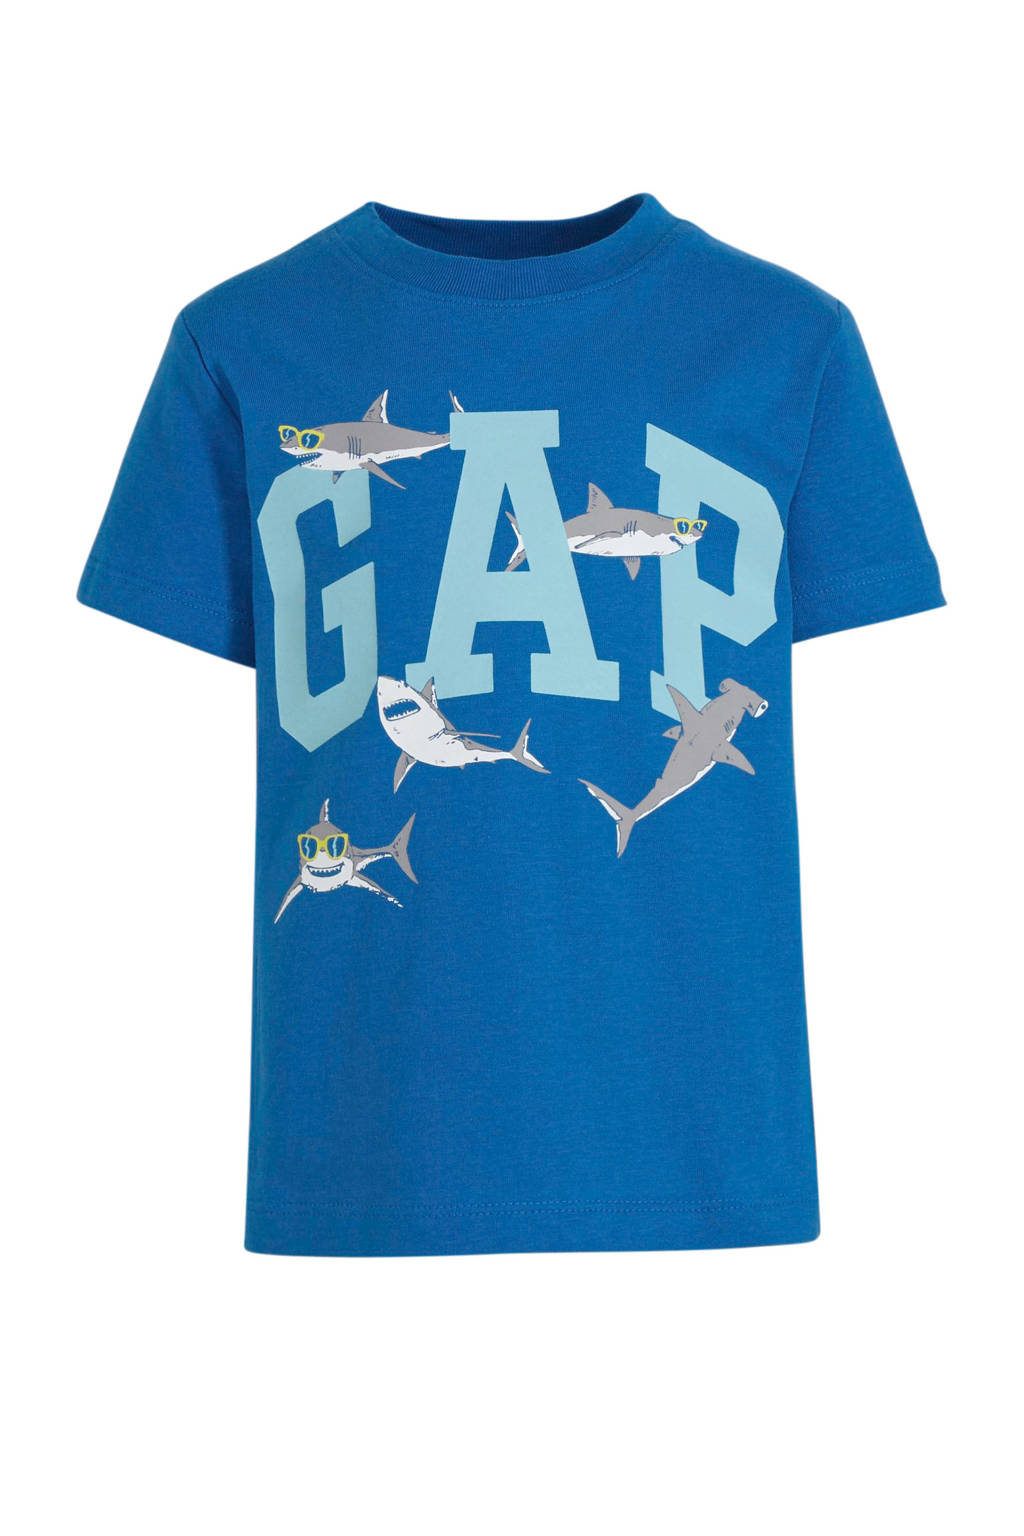 GAP T-shirt met logo blauw/wit, Blauw/wit